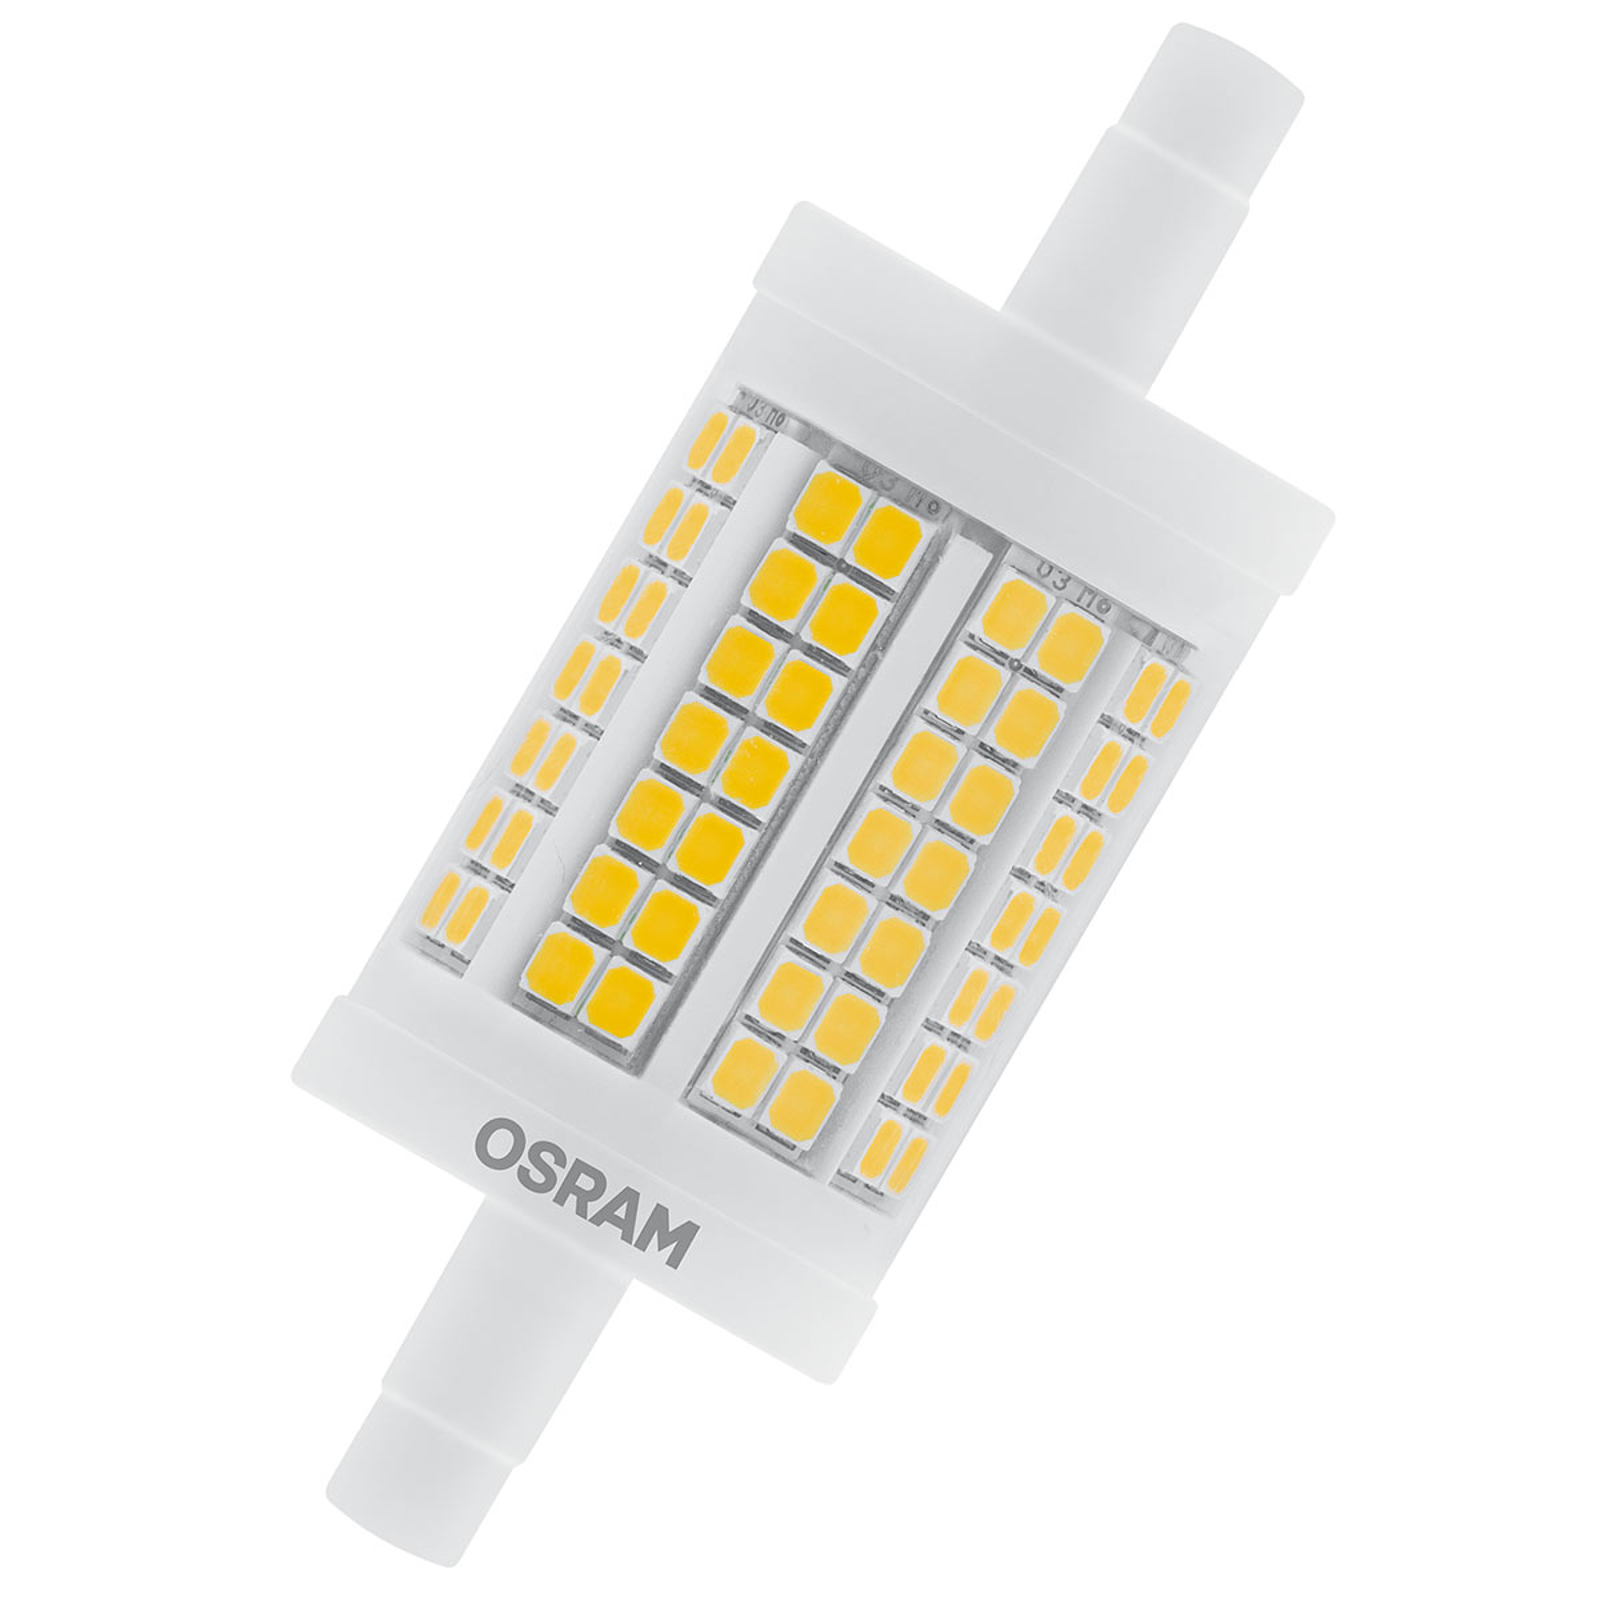 OSRAM LED-stav R7s 11,5 W varmhvit 1521 lm